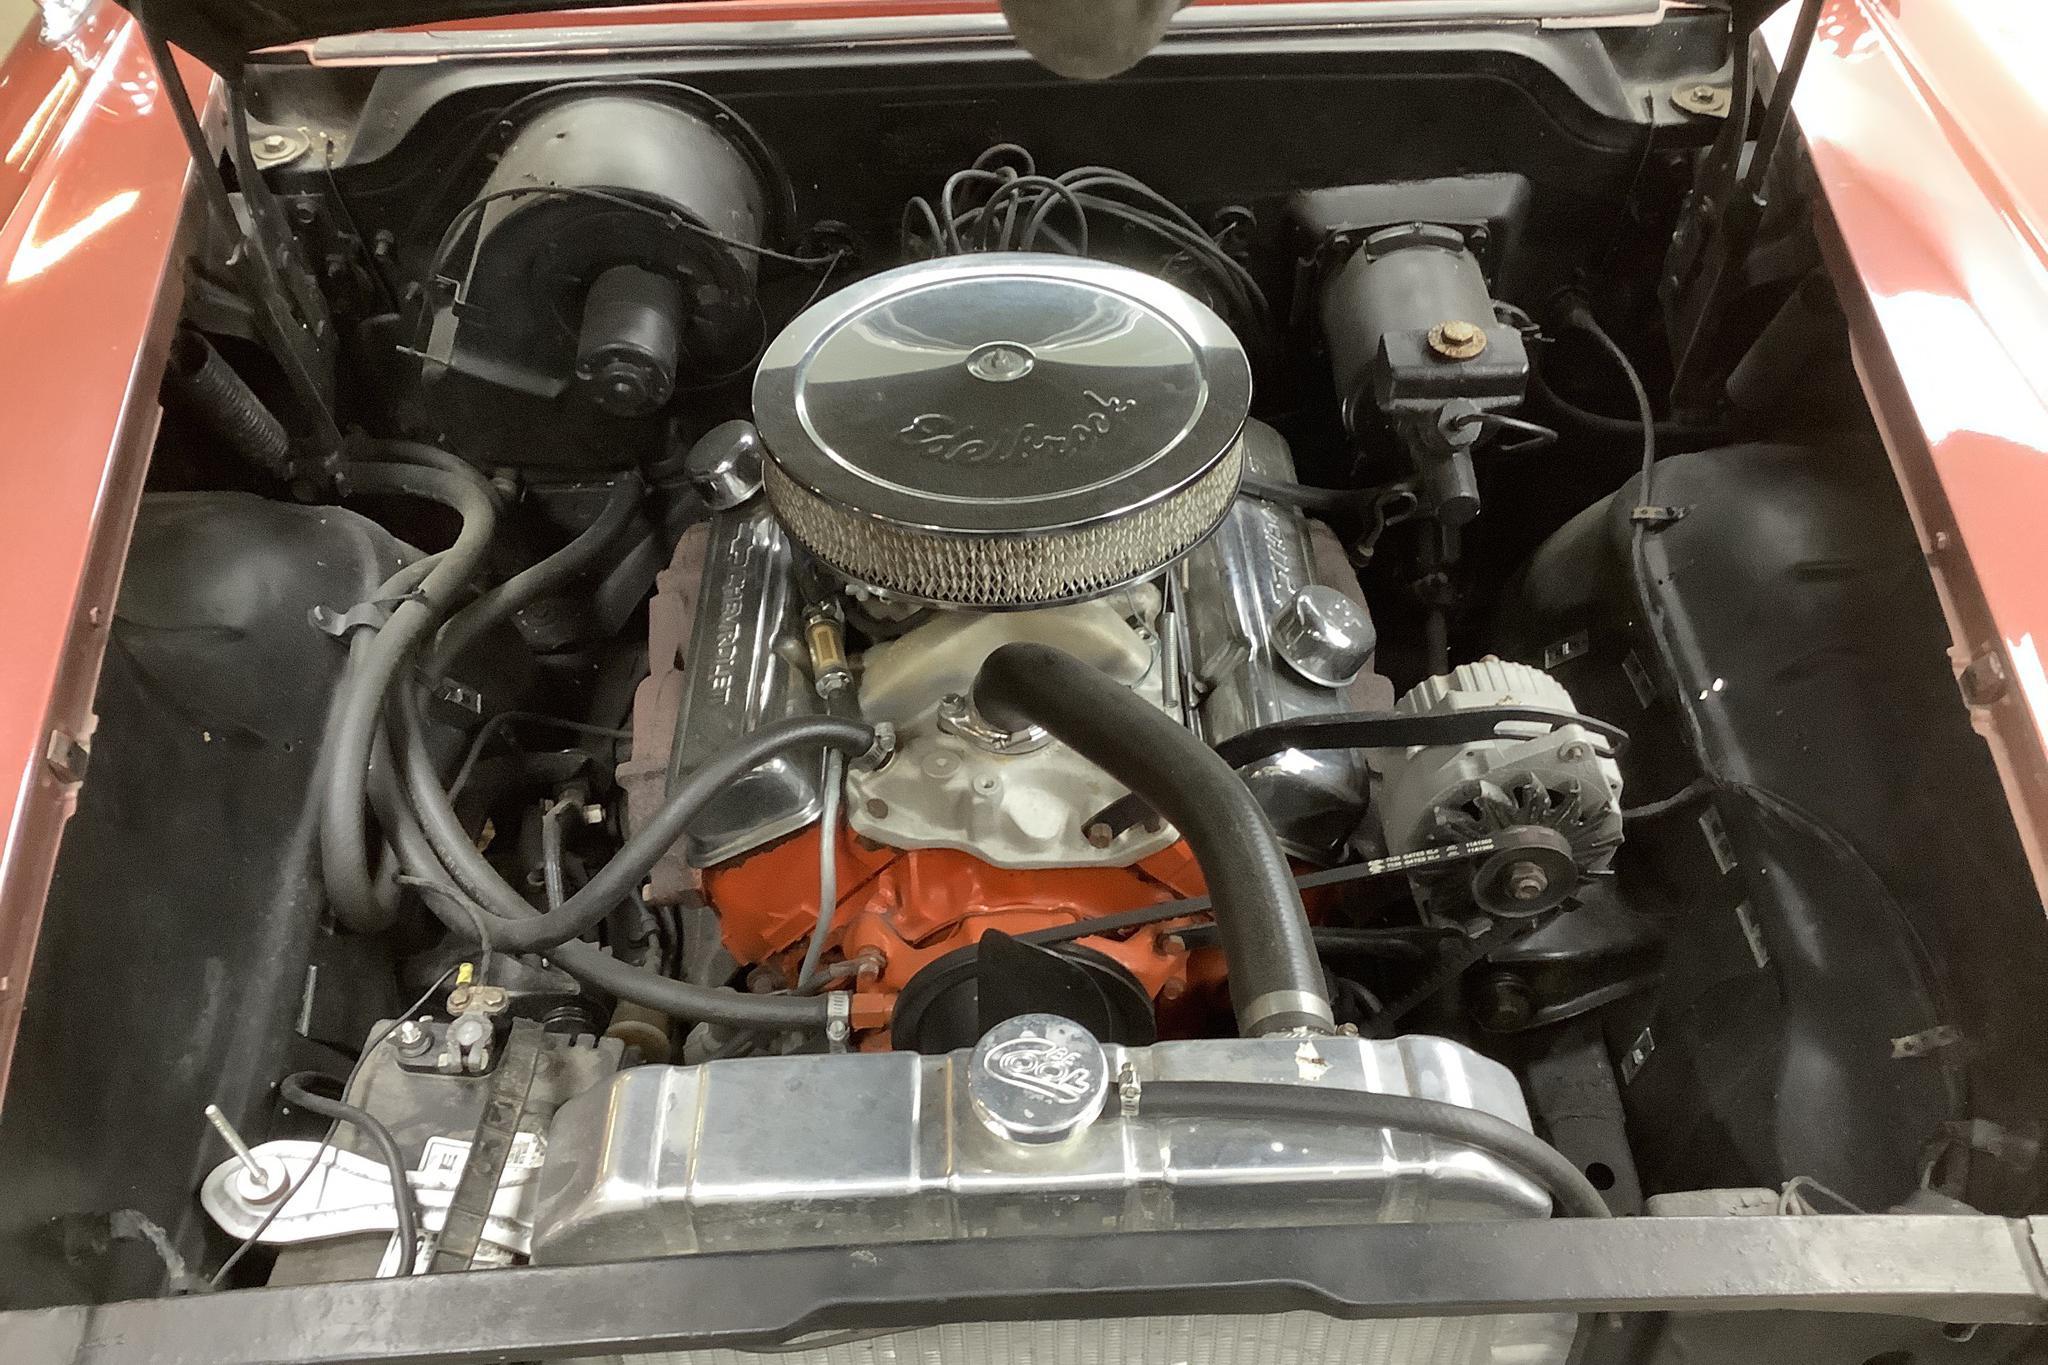 Chevrolet Bel Air 283 ci 4-door (250hk) - 6 999 mil - Automat - Dark Red - 1958